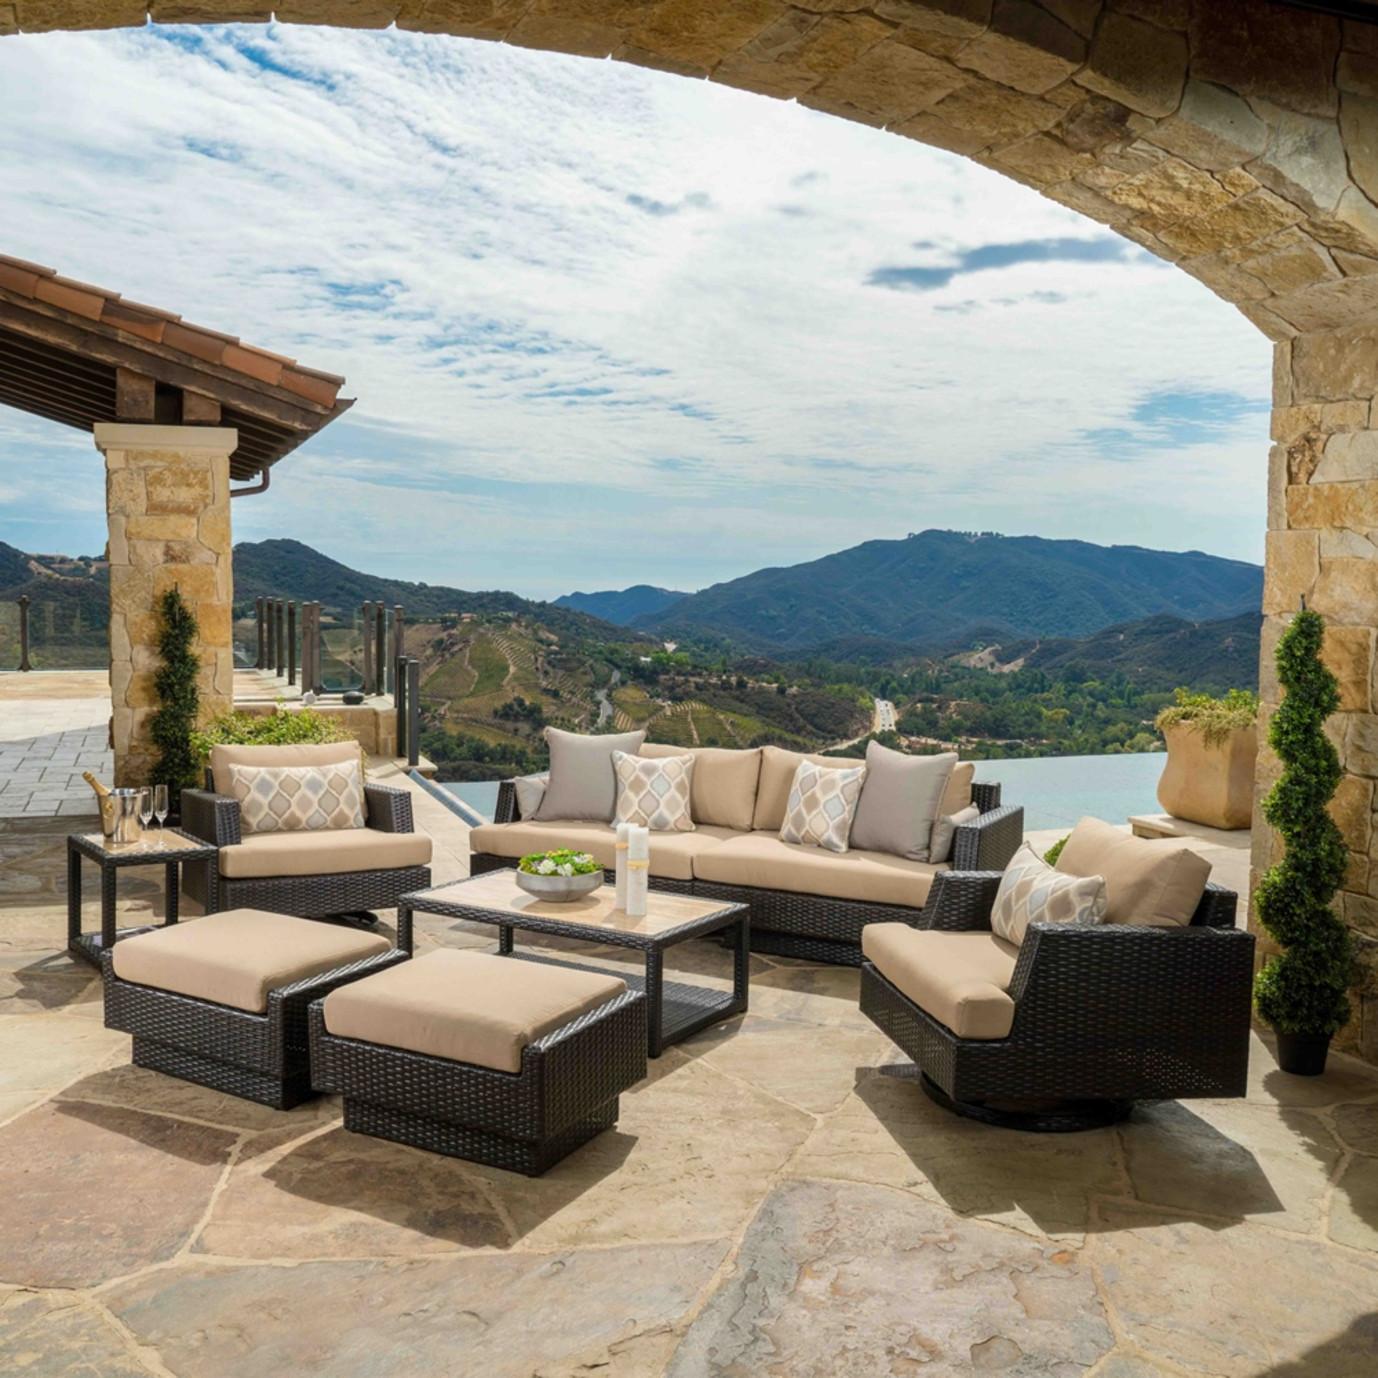 Portofino™ Comfort 8pc Motion Club Seating Set - Heather Beige